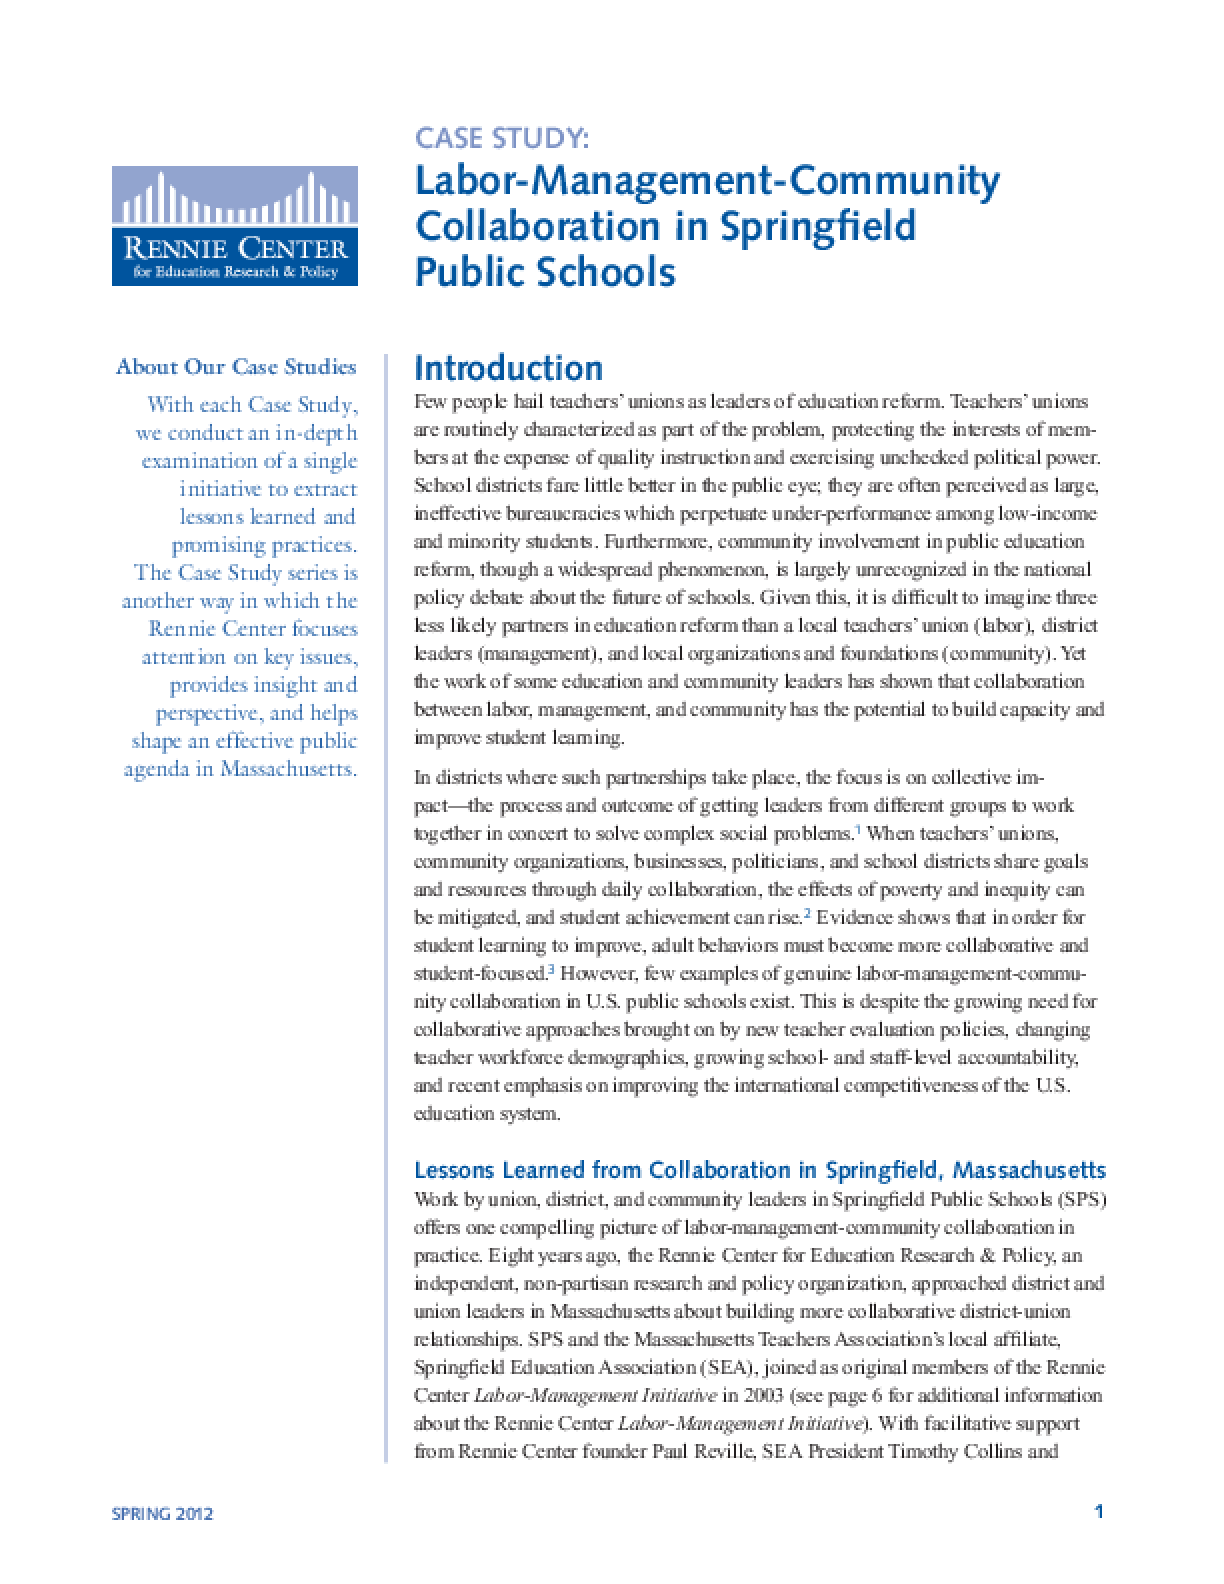 Labor-Management-Community Collaboration in Springfield Public Schools